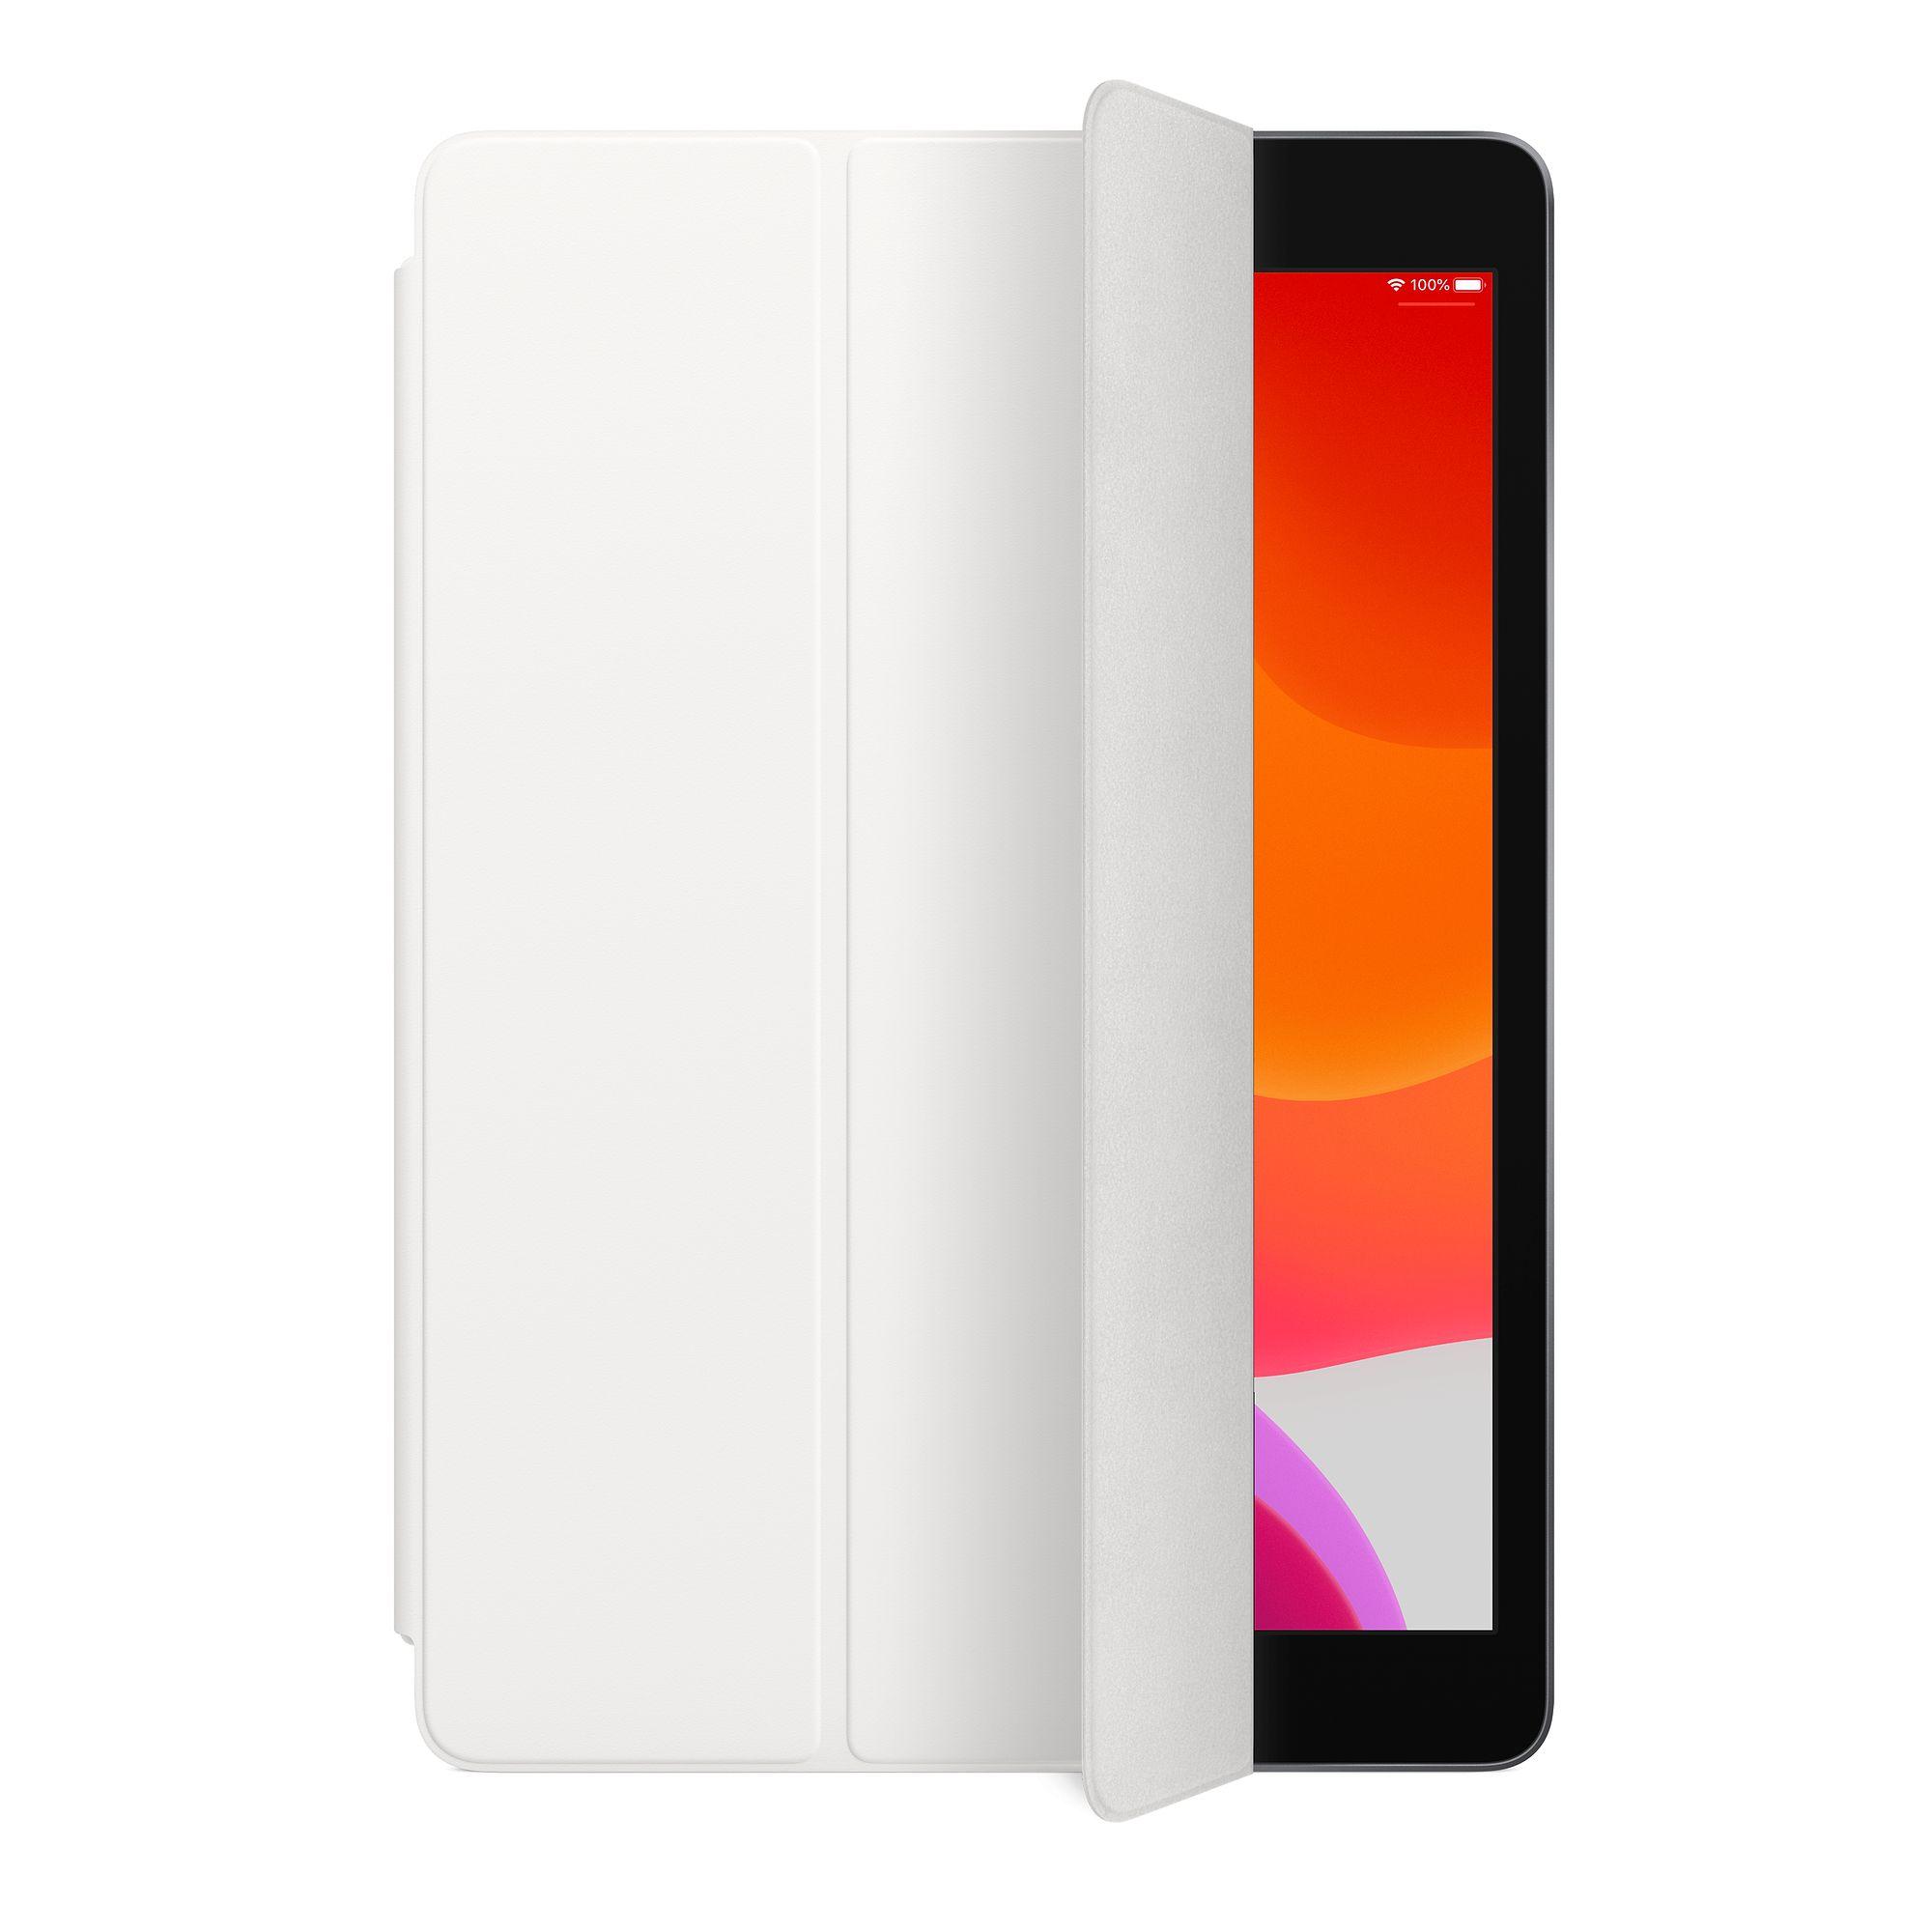 "Чехол Apple Smart Cover для iPad 10.2"" / iPad Air White MVQ32"